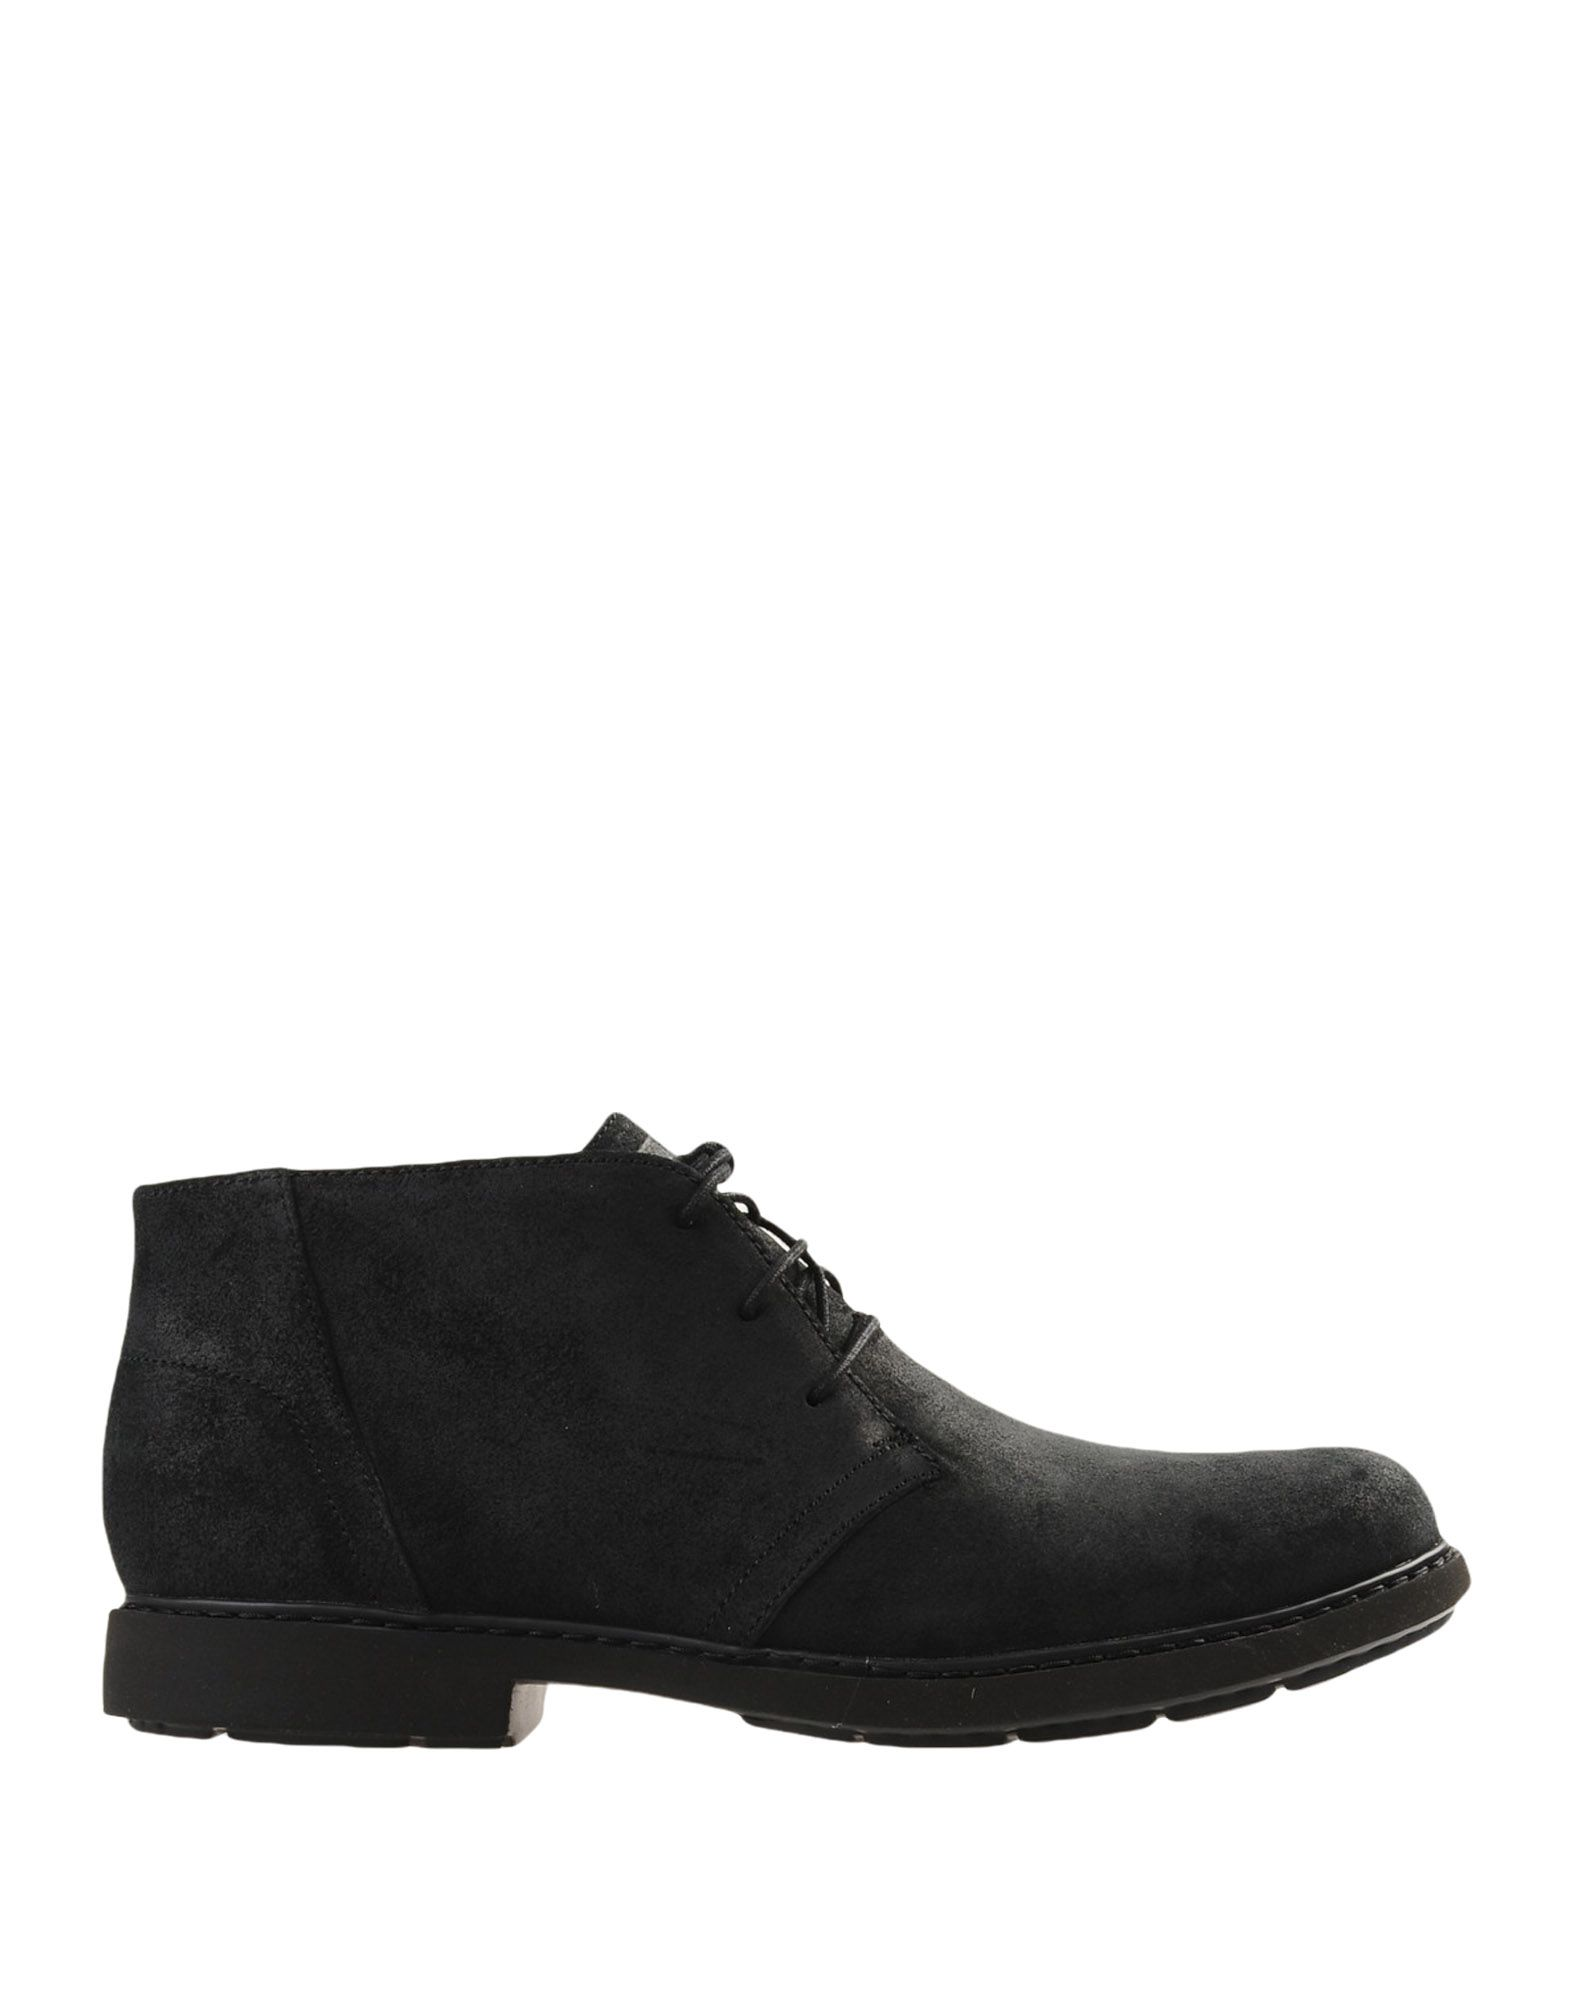 Camper Boots - Men  Camper Boots online on  Men Canada - 11555415CU 633bf6